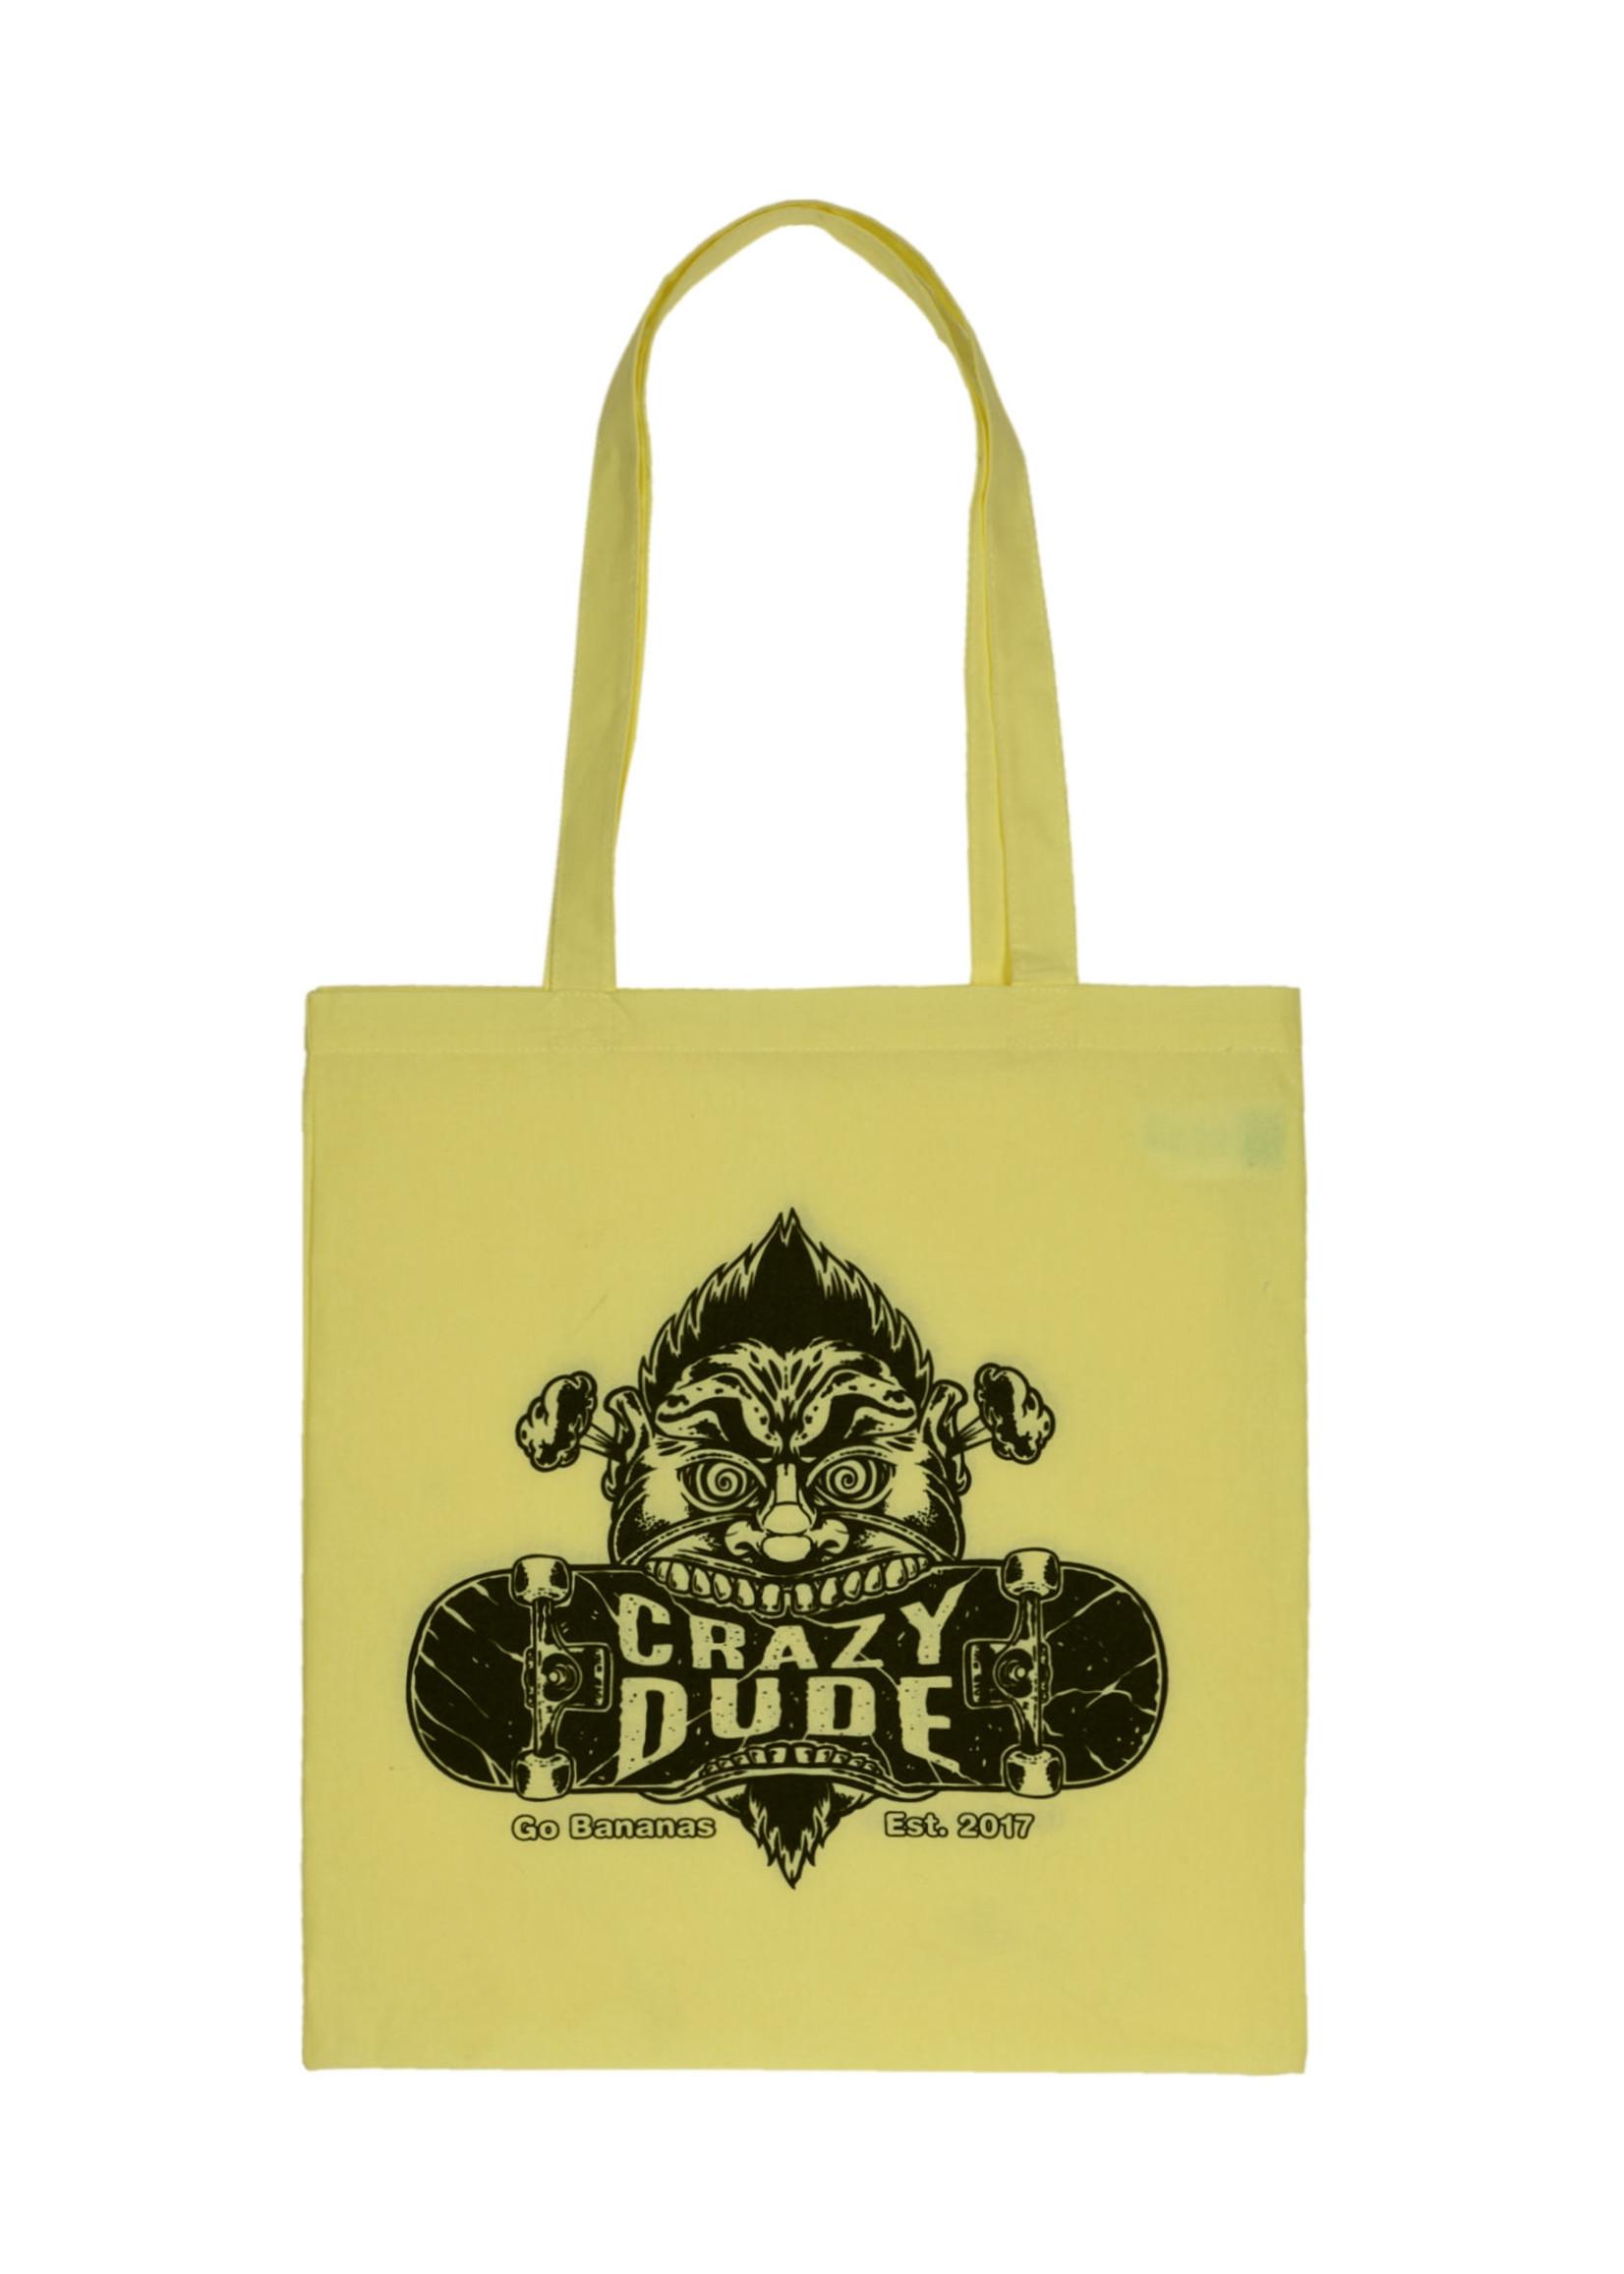 Crazy Dude Crazy Dude Tote Bag Destroyer Pastel Lemon